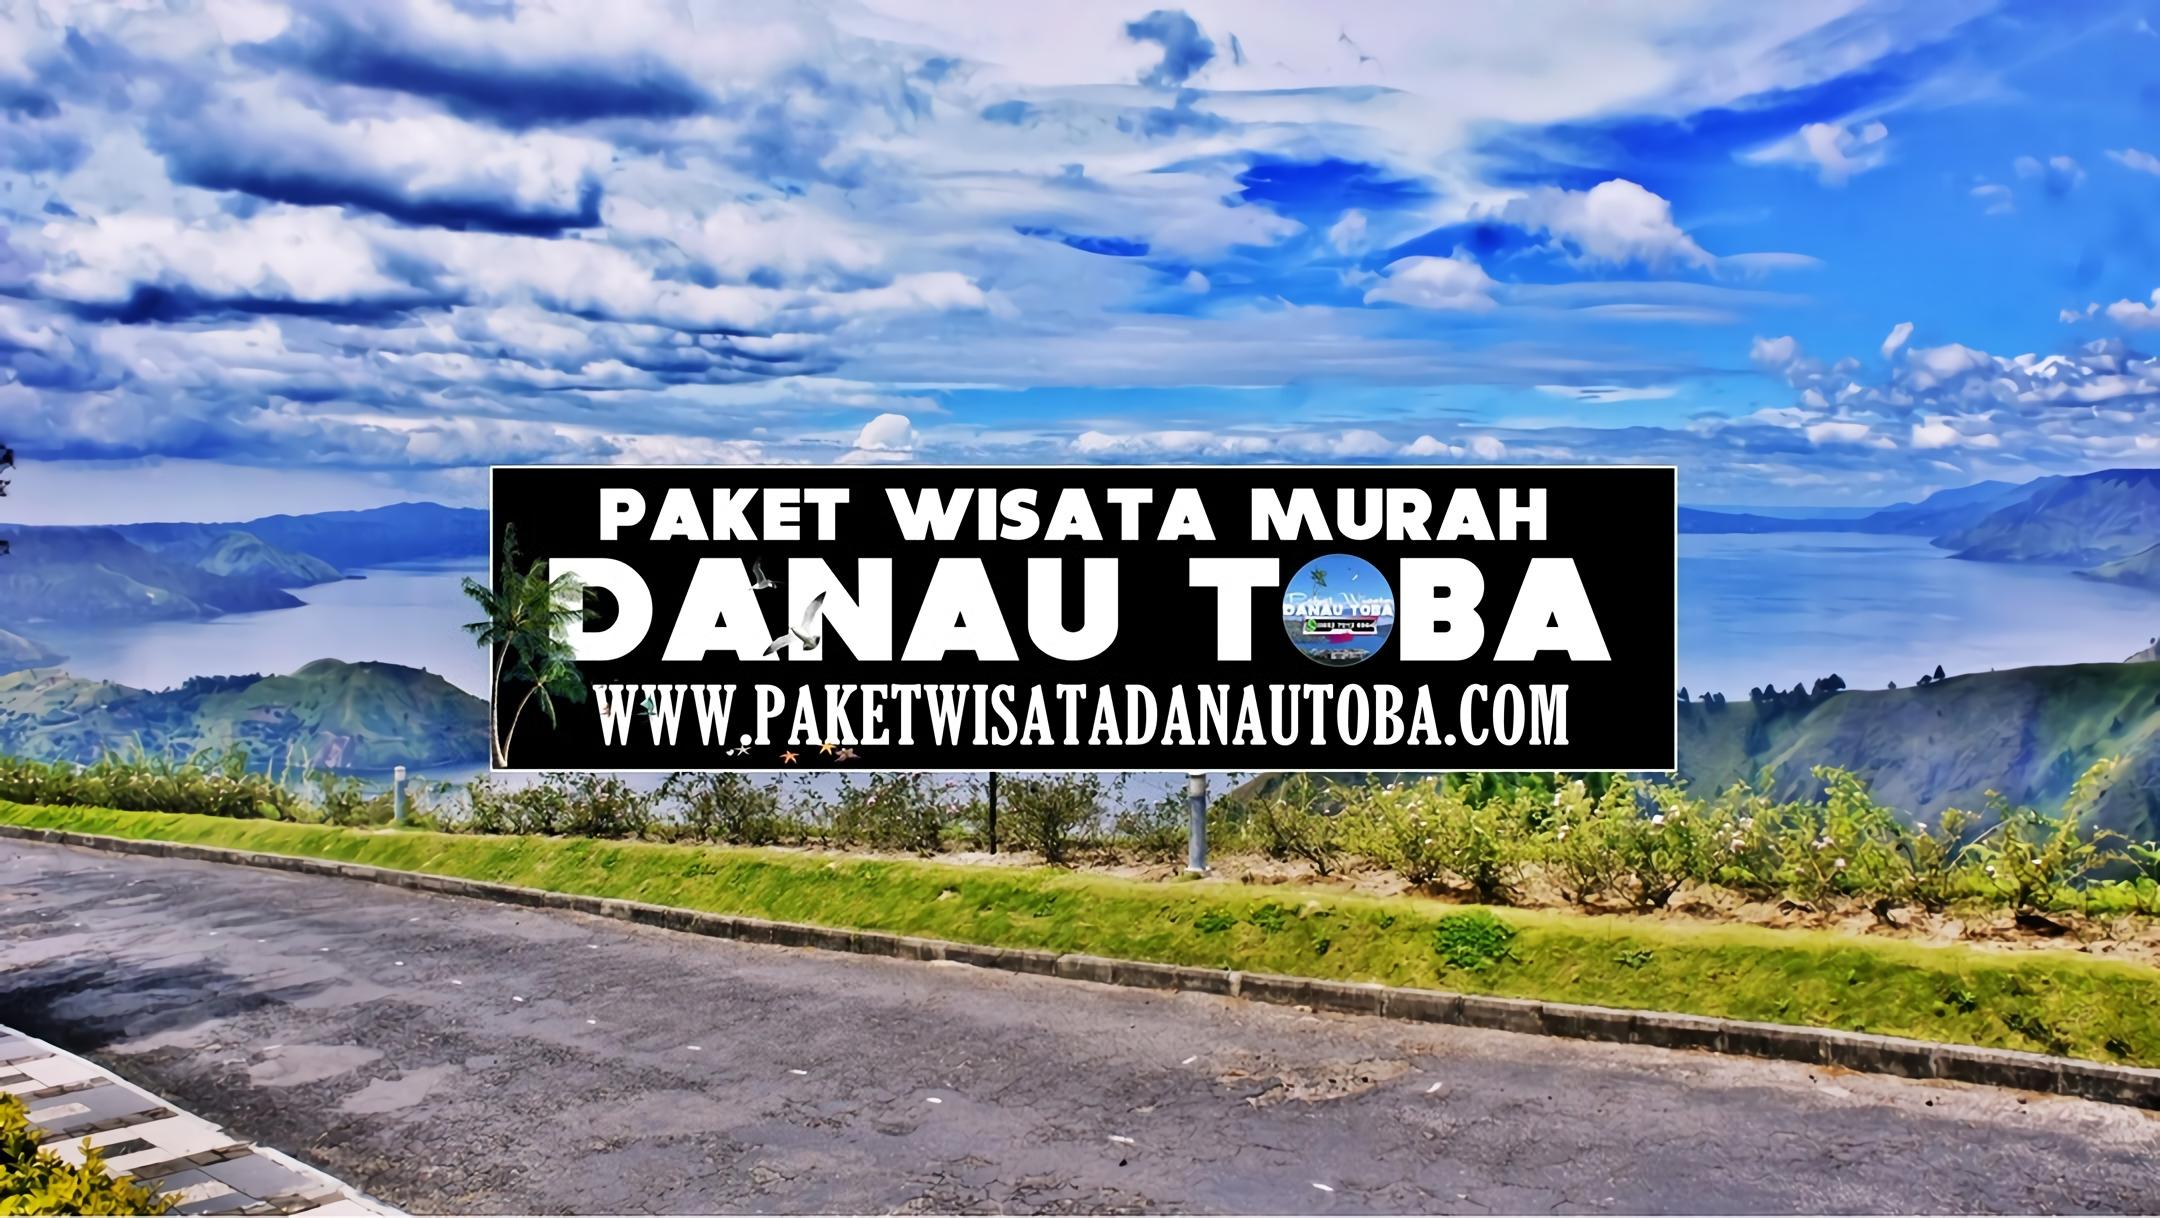 paket wisata danau toba (@paketwisatadanautoba) Cover Image